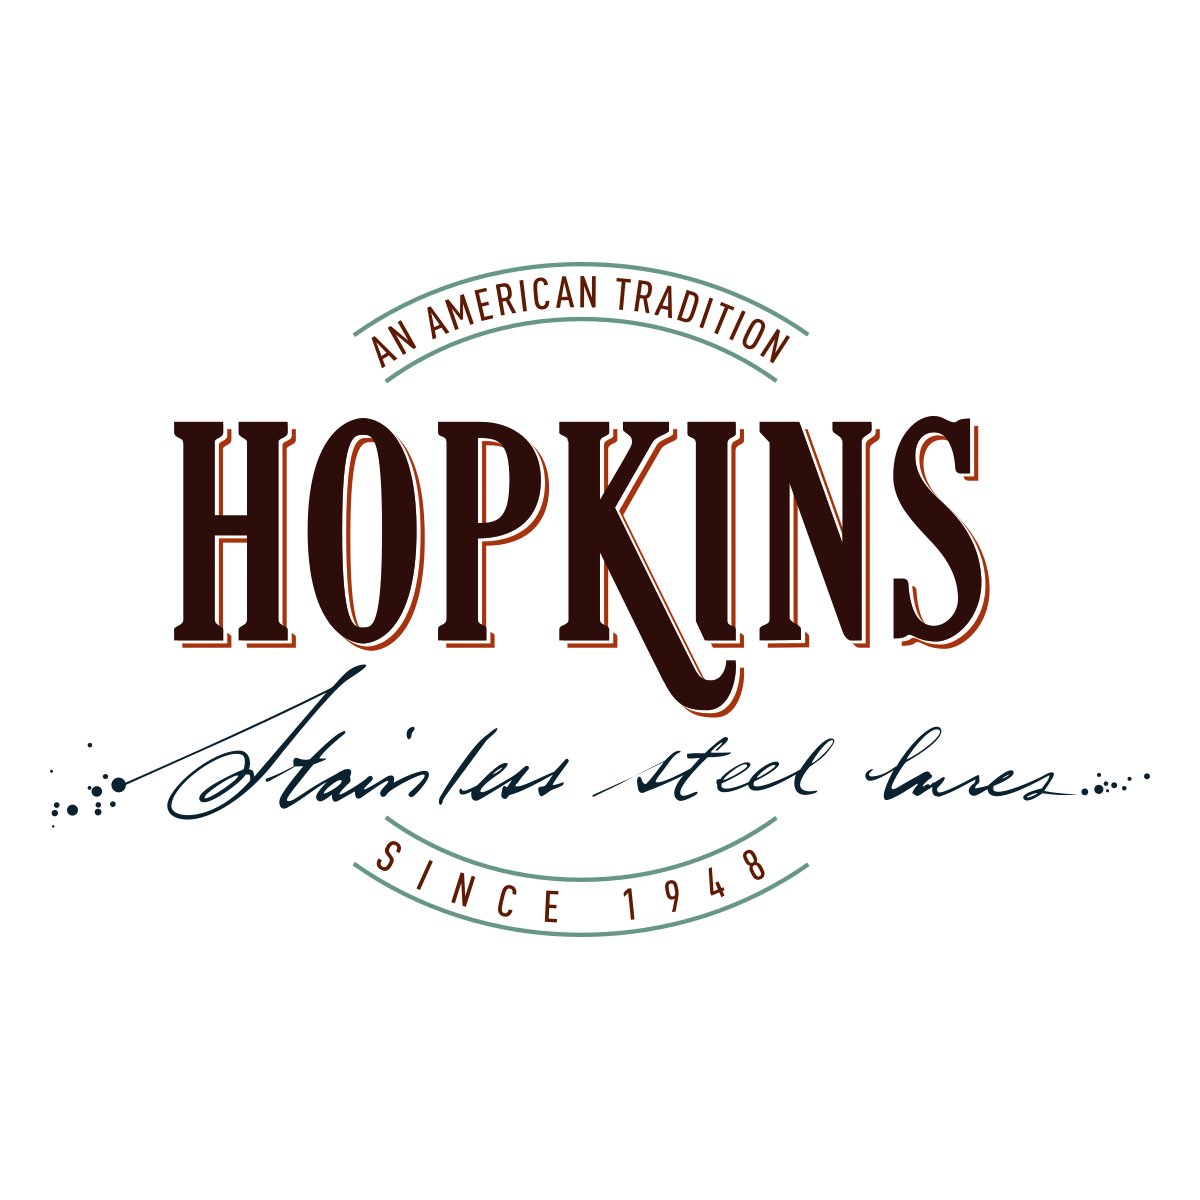 Hopkins Lures